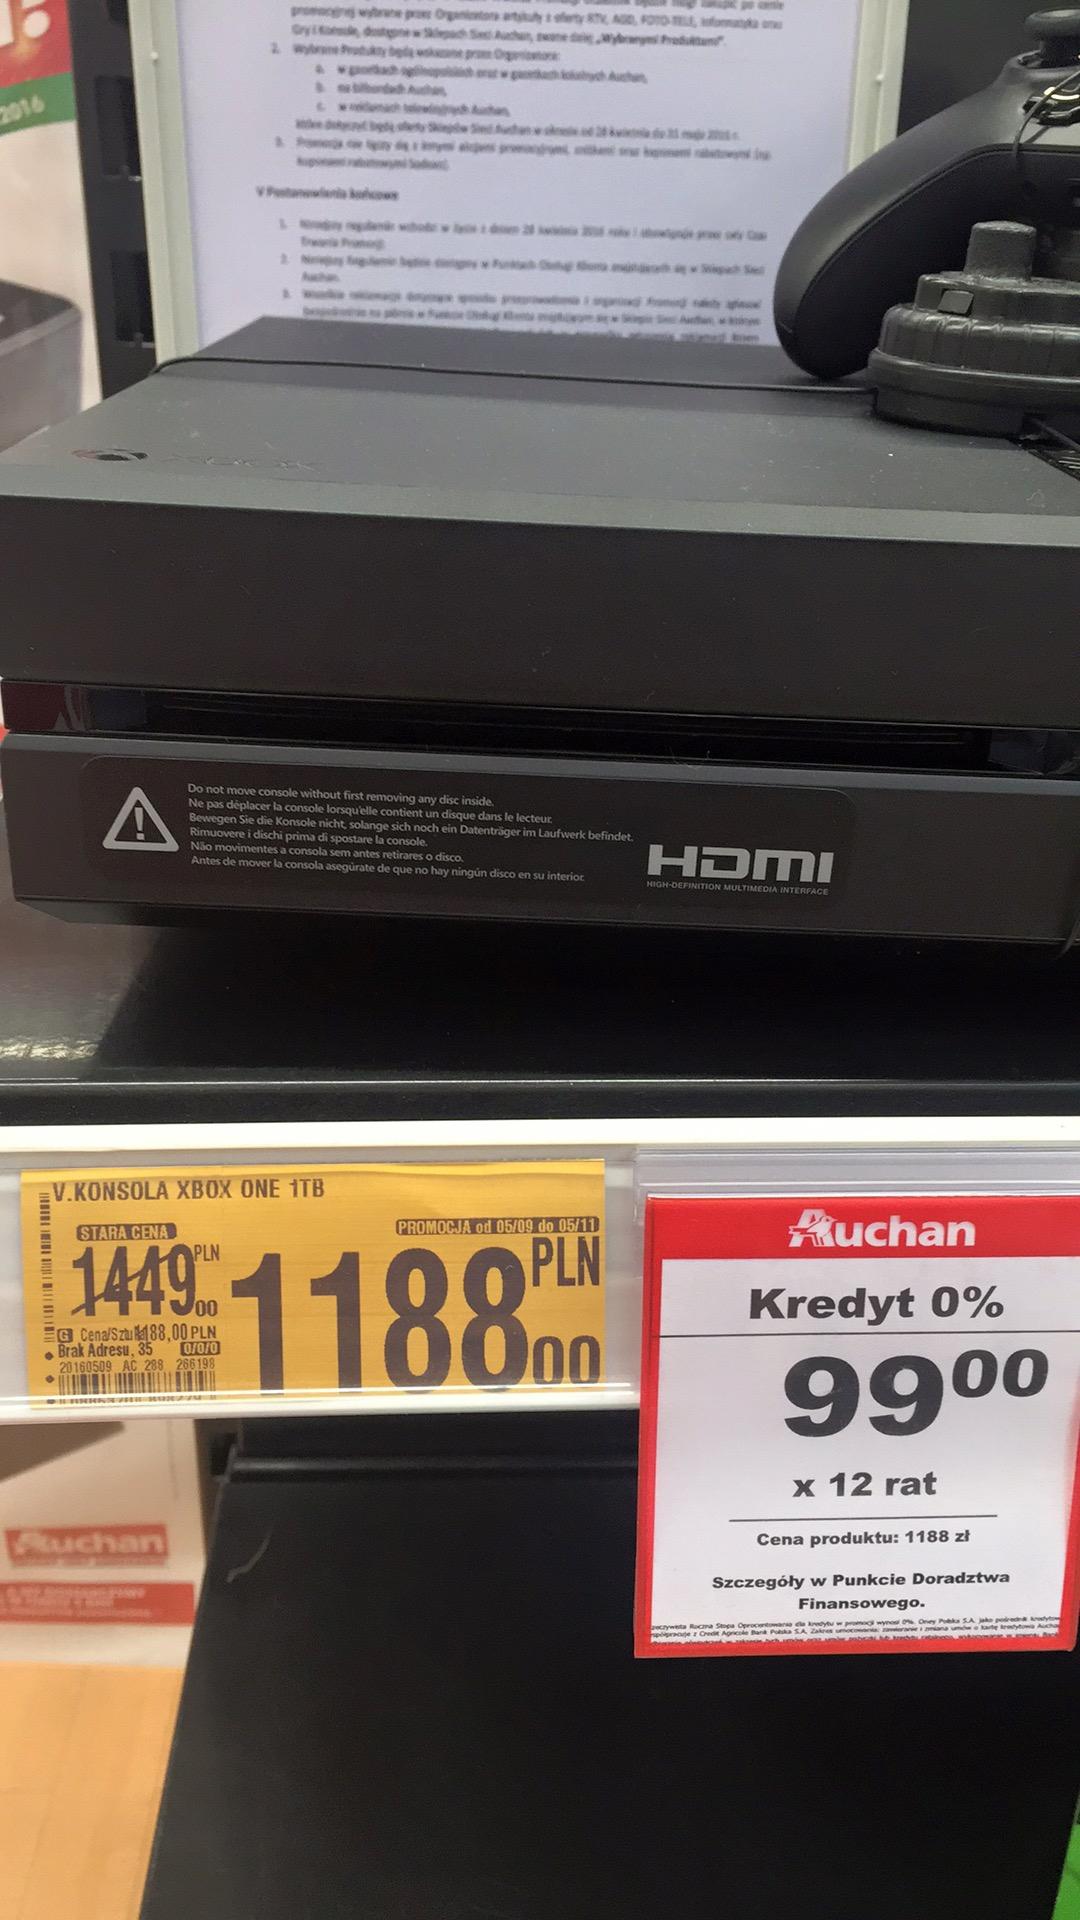 Xbox one 1TB @ Auchan